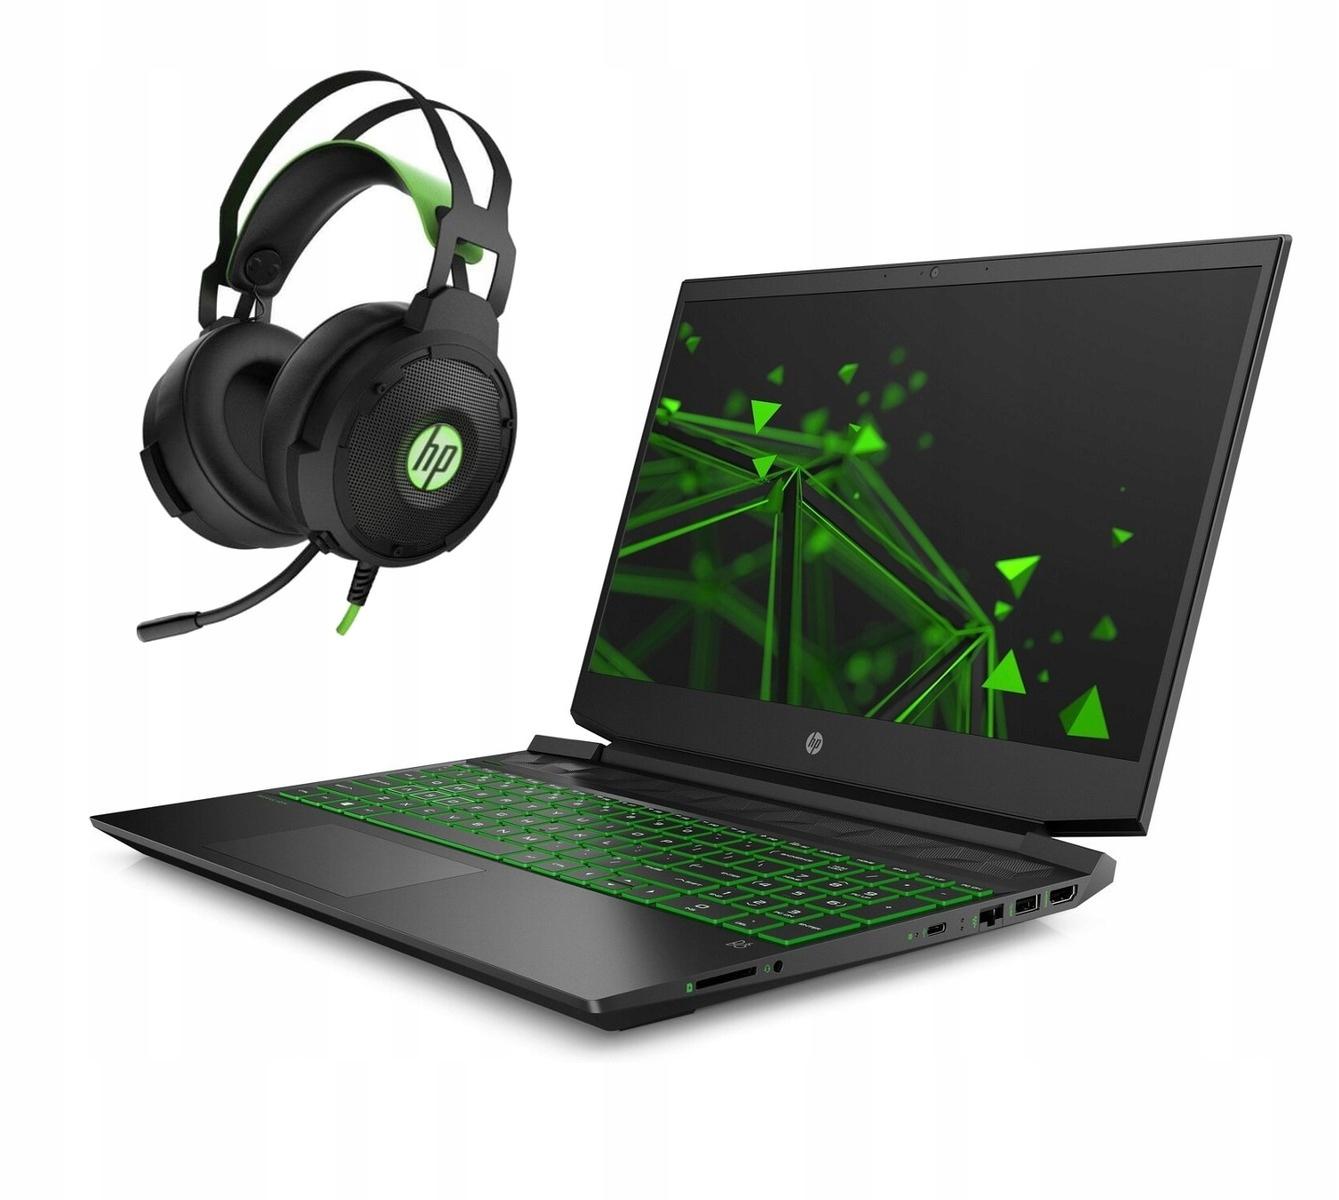 Gamingowy lapek HP 15-ec0010nw R7-3750H 512/8G/15,6 8BQ91EA, słuchawy HP gratis